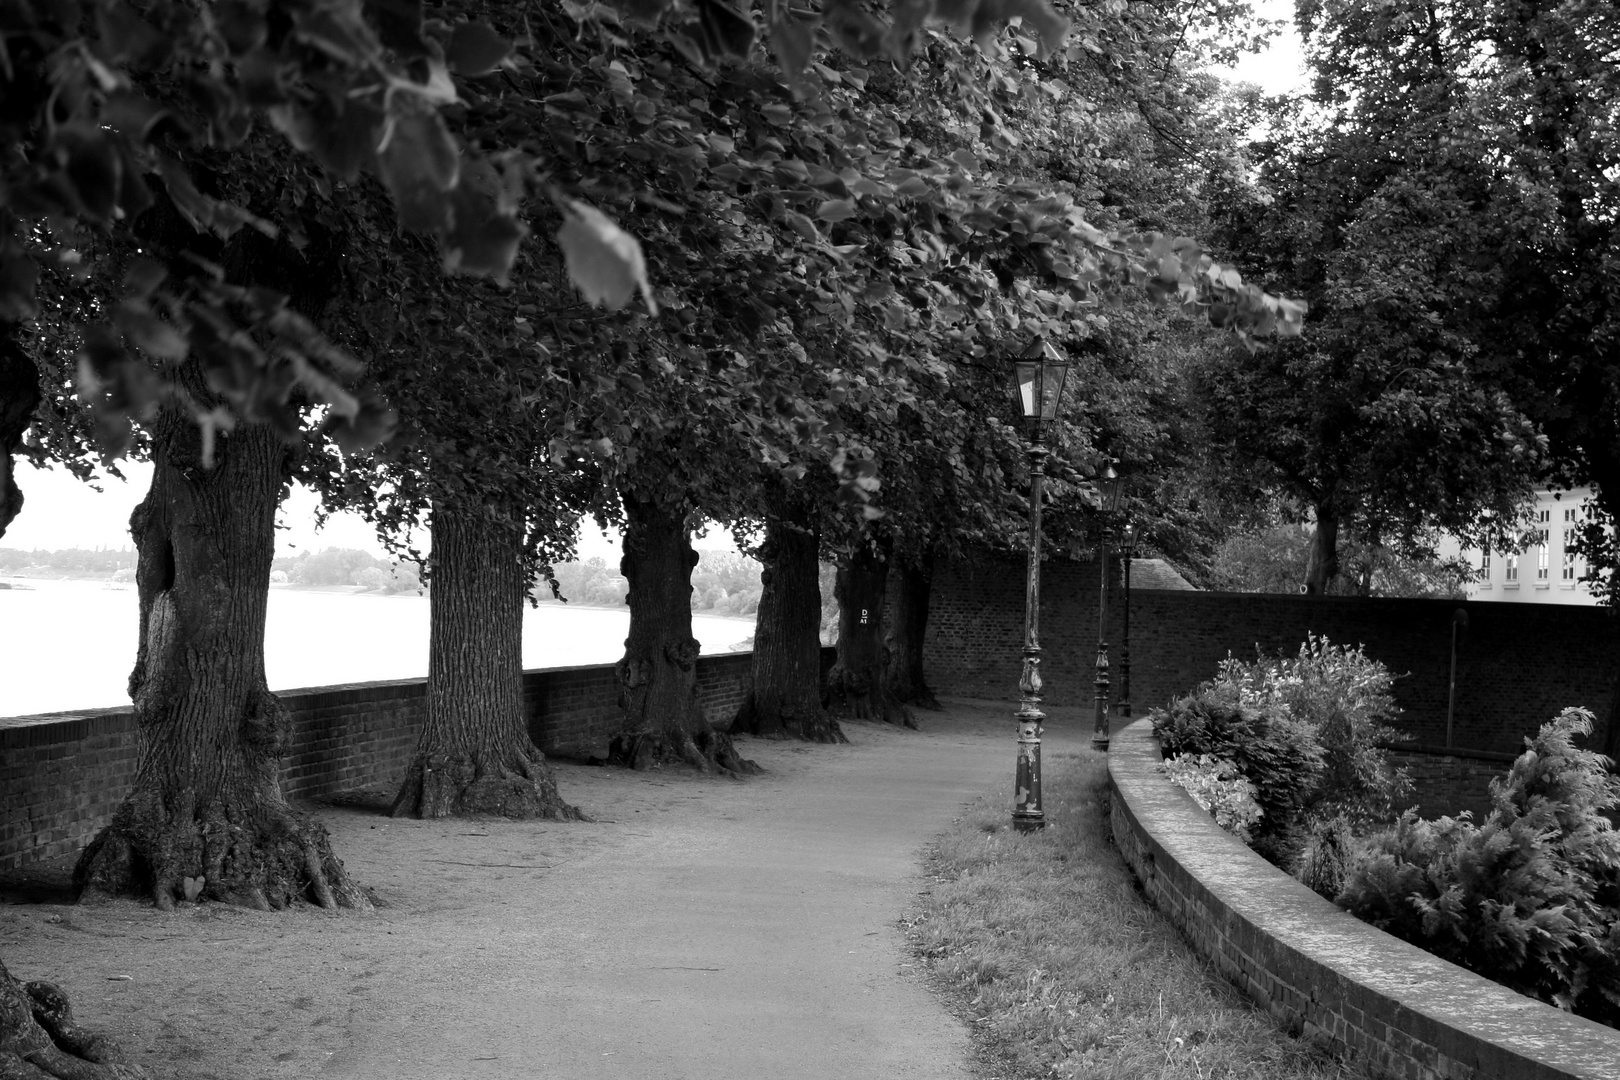 Spätsommer am Rhein